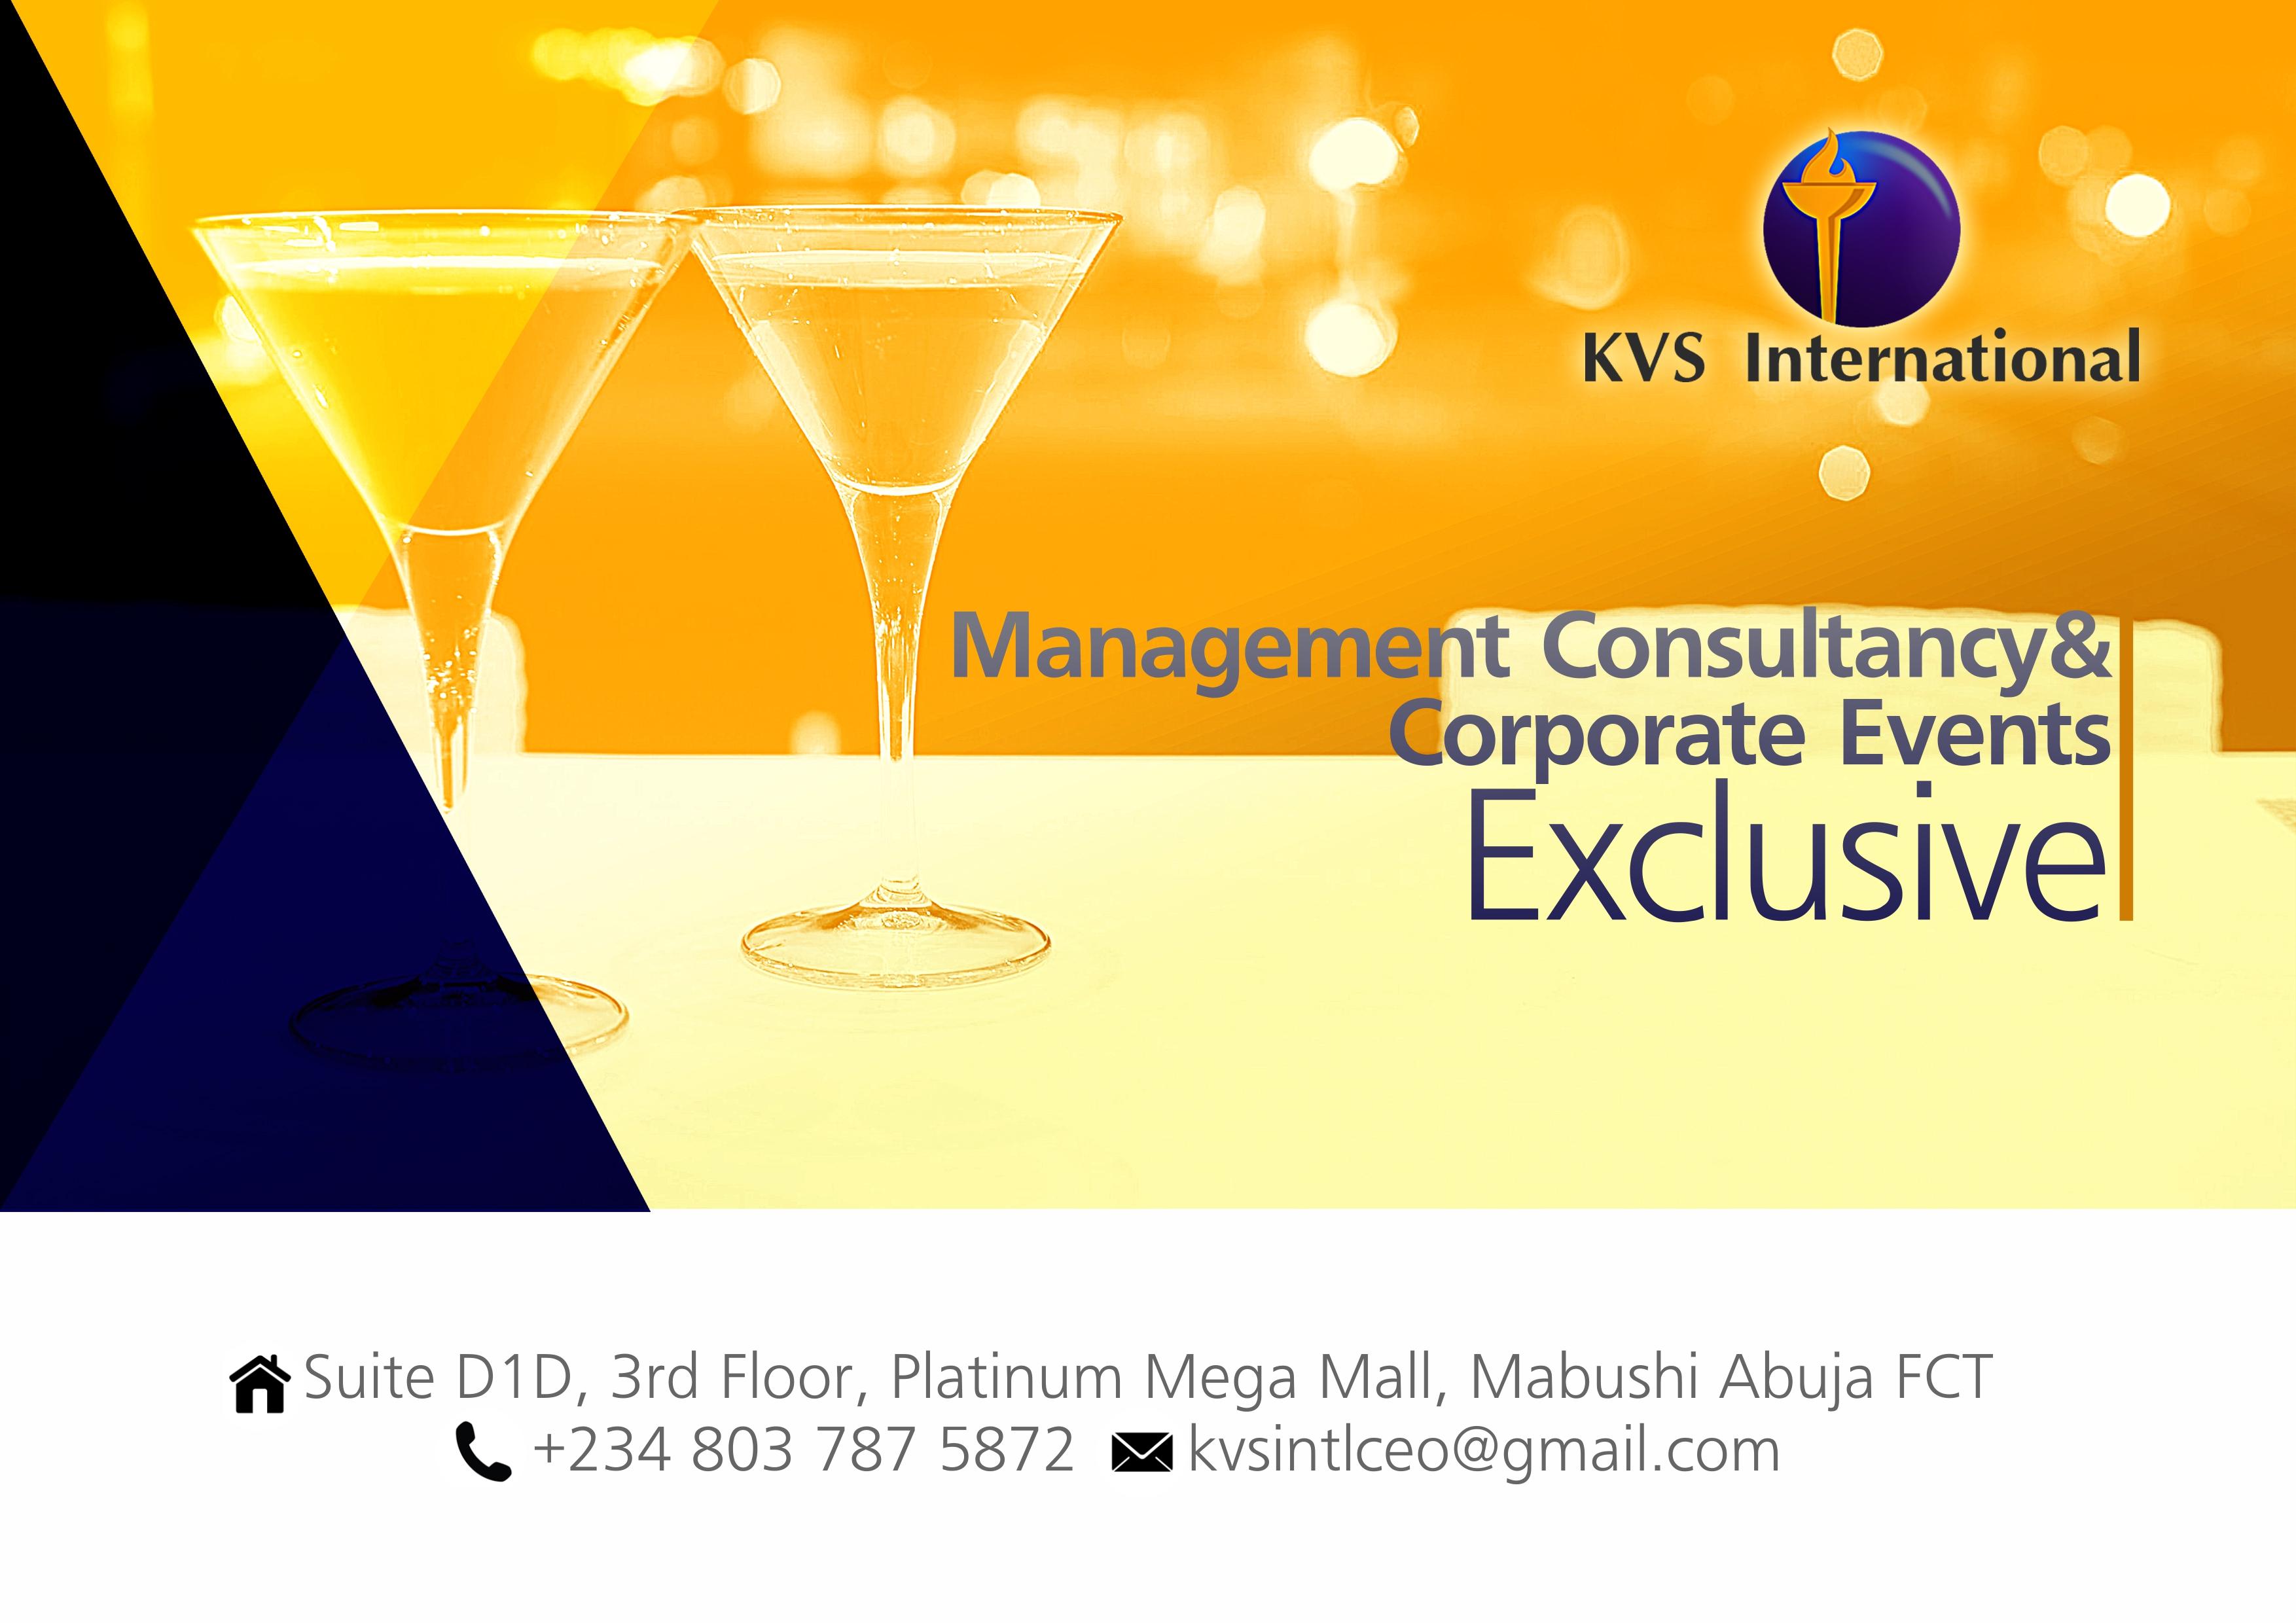 KVS International